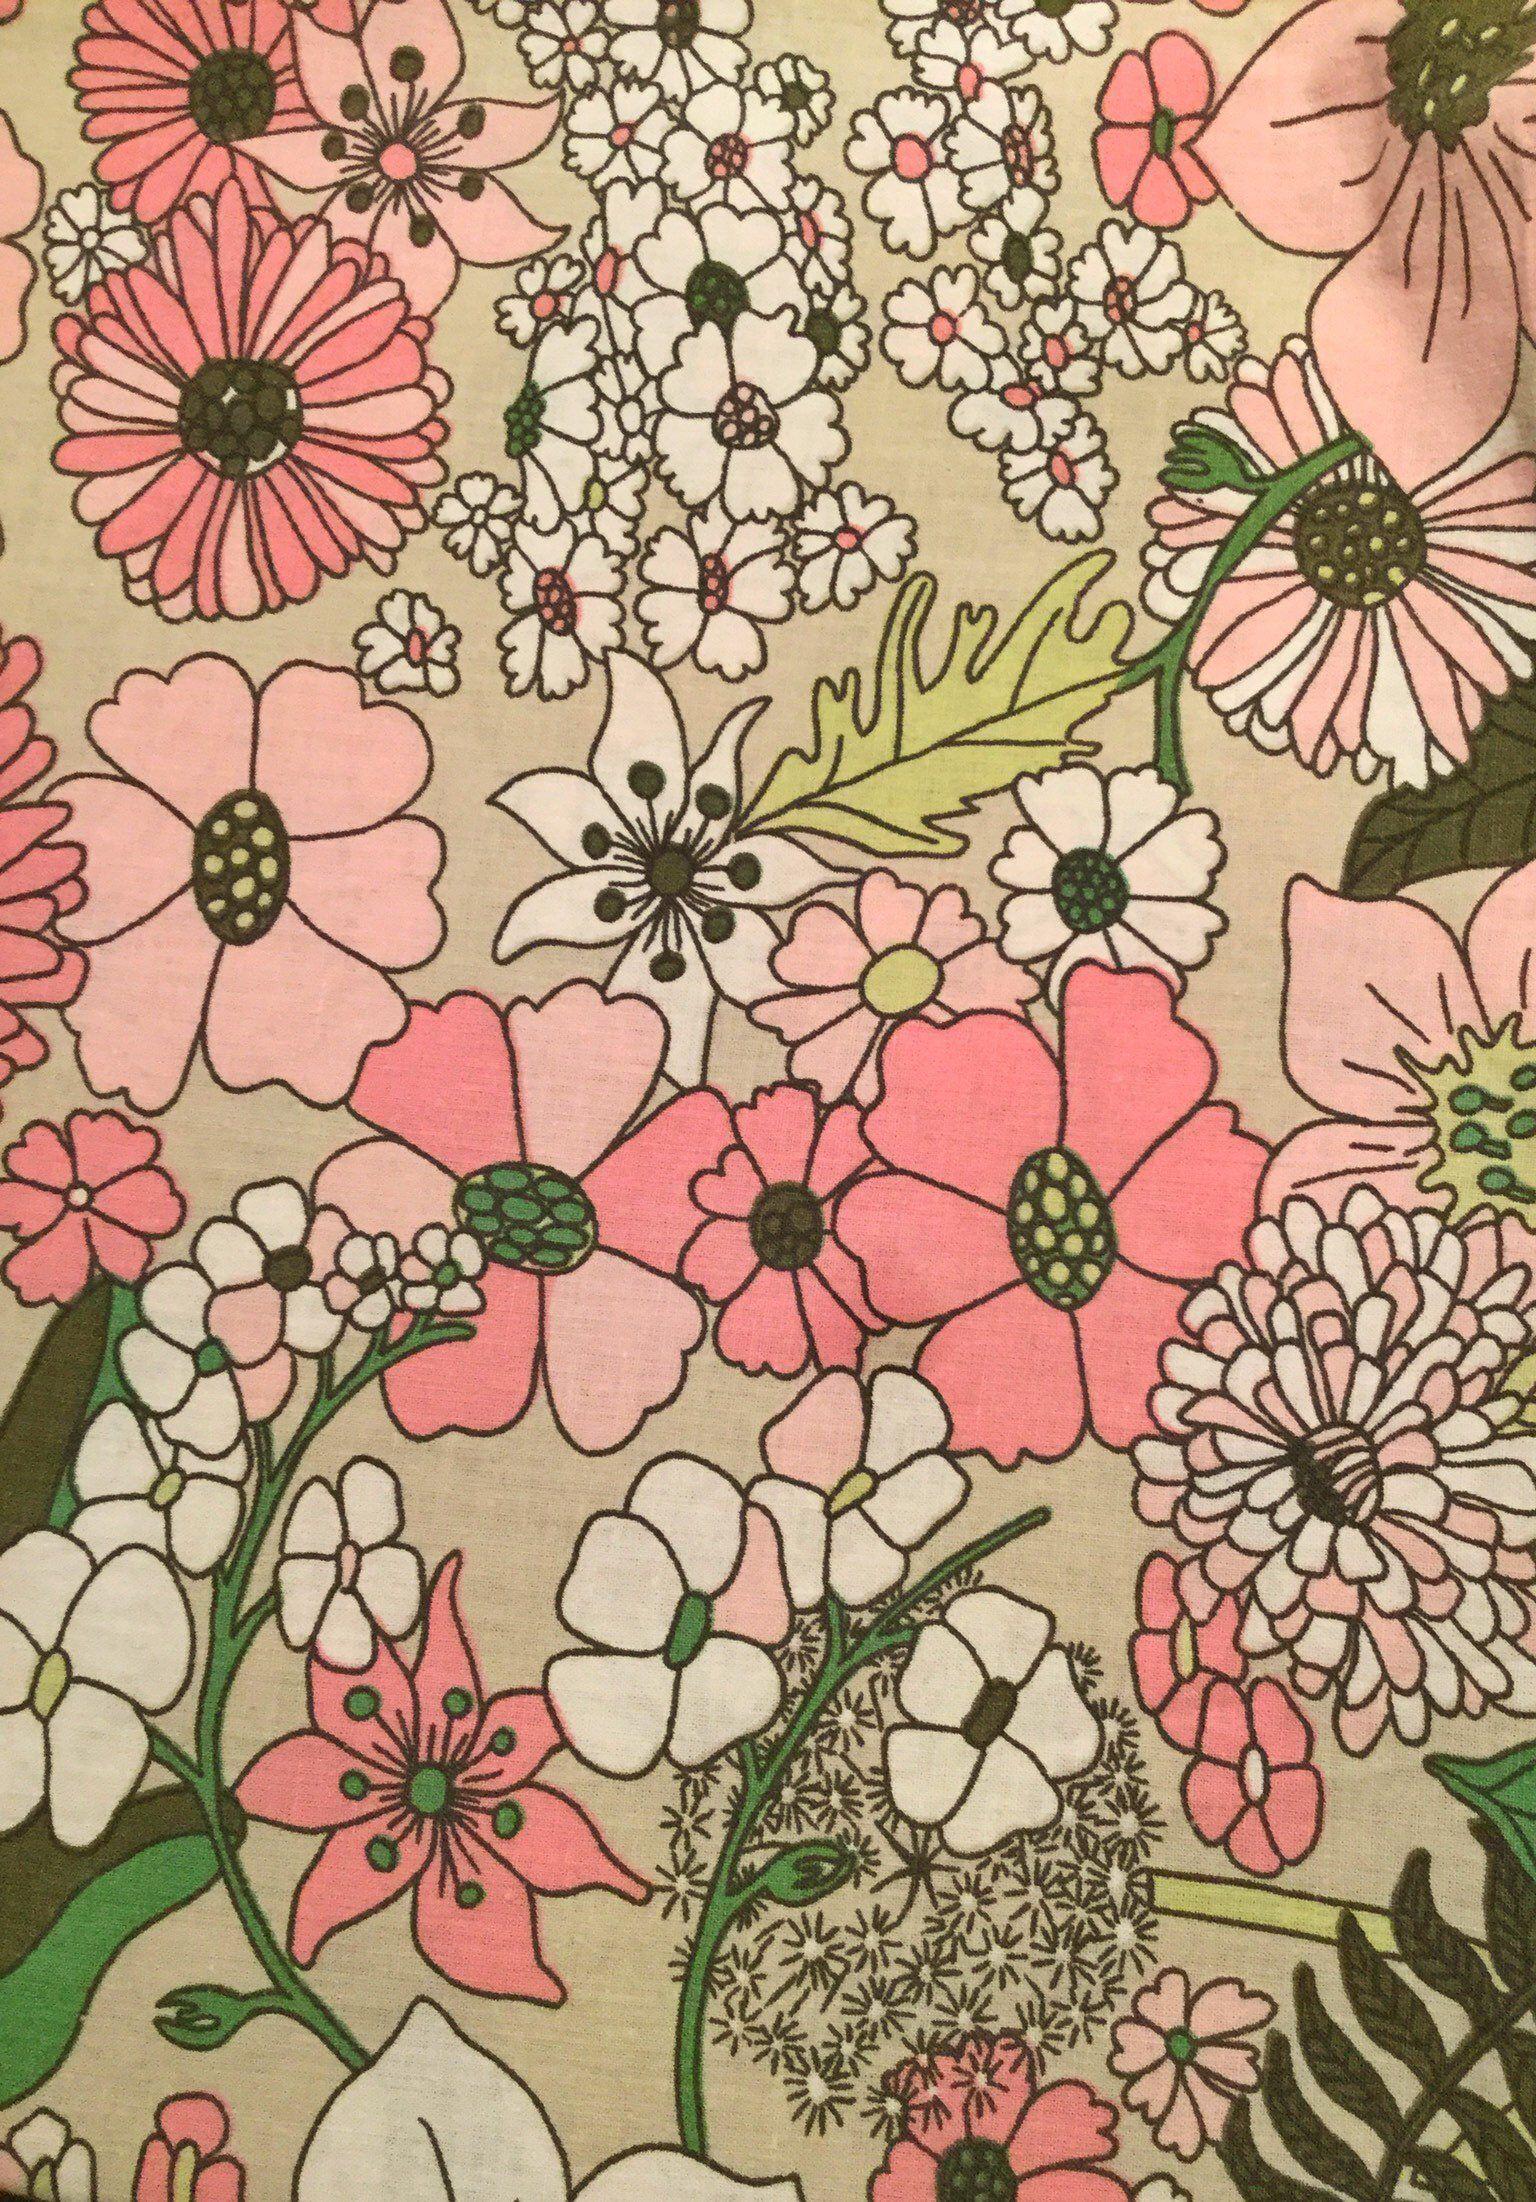 Www Inspiria Etsy Com Scandinavian Vintage Fabric Mod Scandi Fabric Pink Green Floral Pattern Svedish Design 70s Re In 2020 Retro Prints Retro Fabric Vintage Fabrics